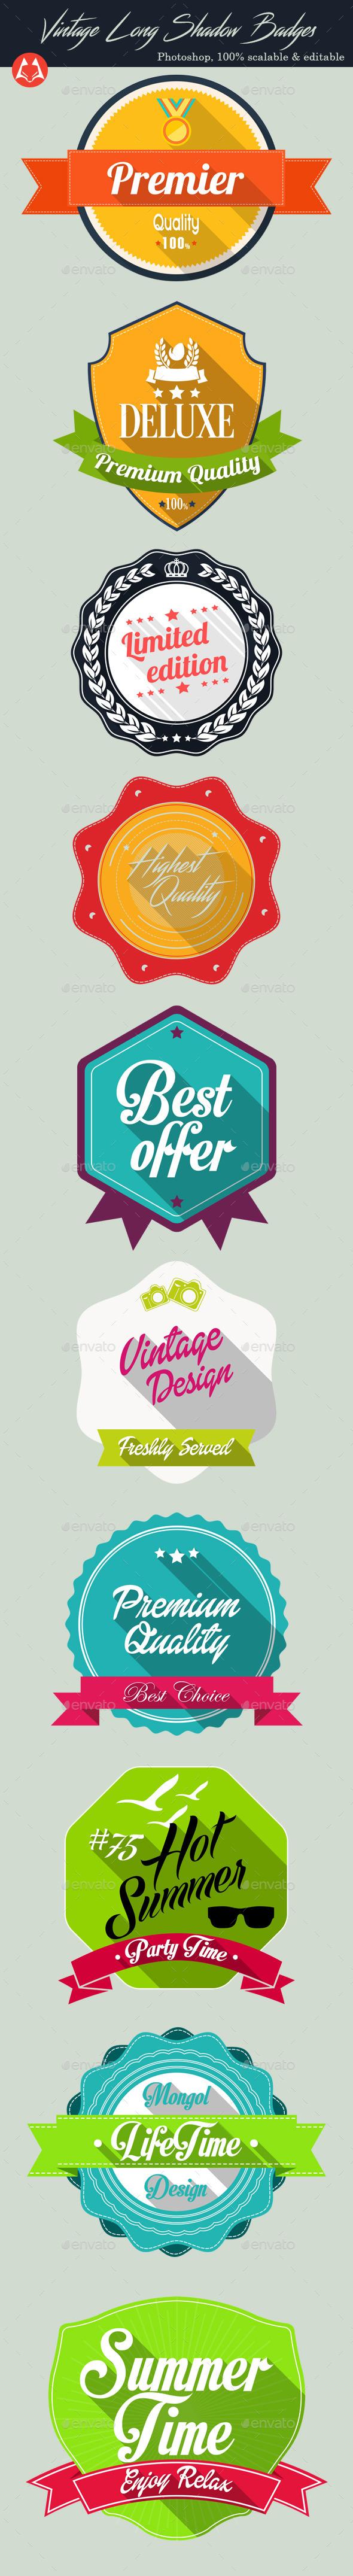 Vintage Long Shadow Badges - Badges & Stickers Web Elements